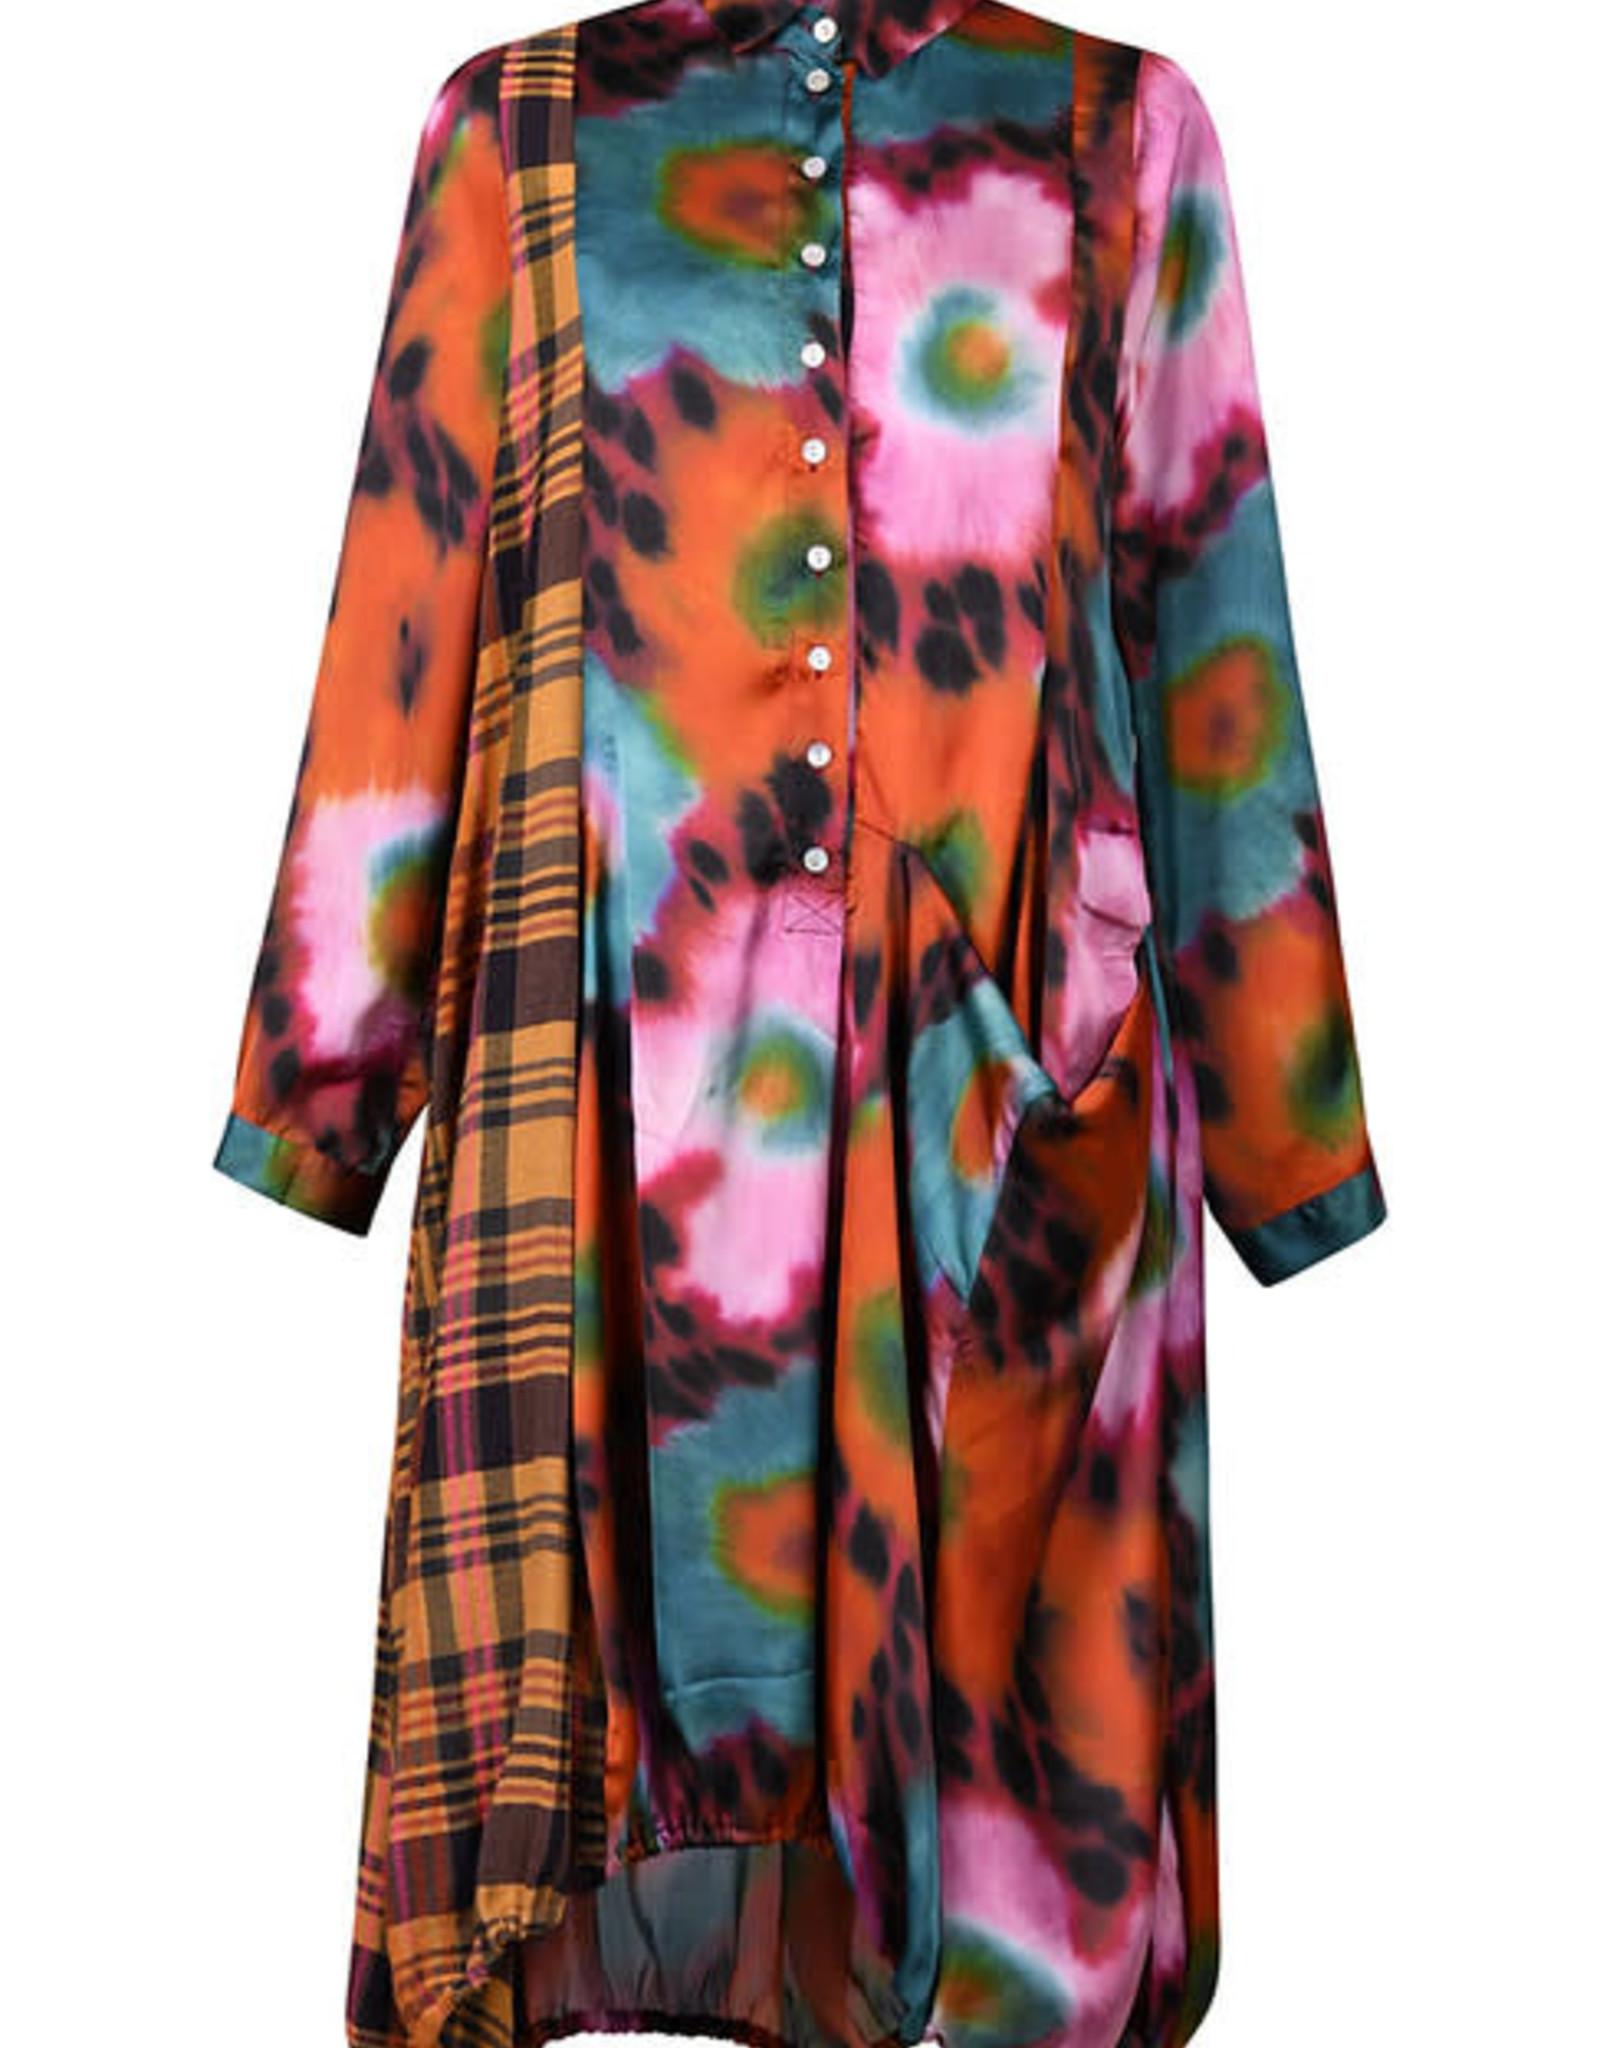 ALEMBIKA - Plaid/Floral Print Dress